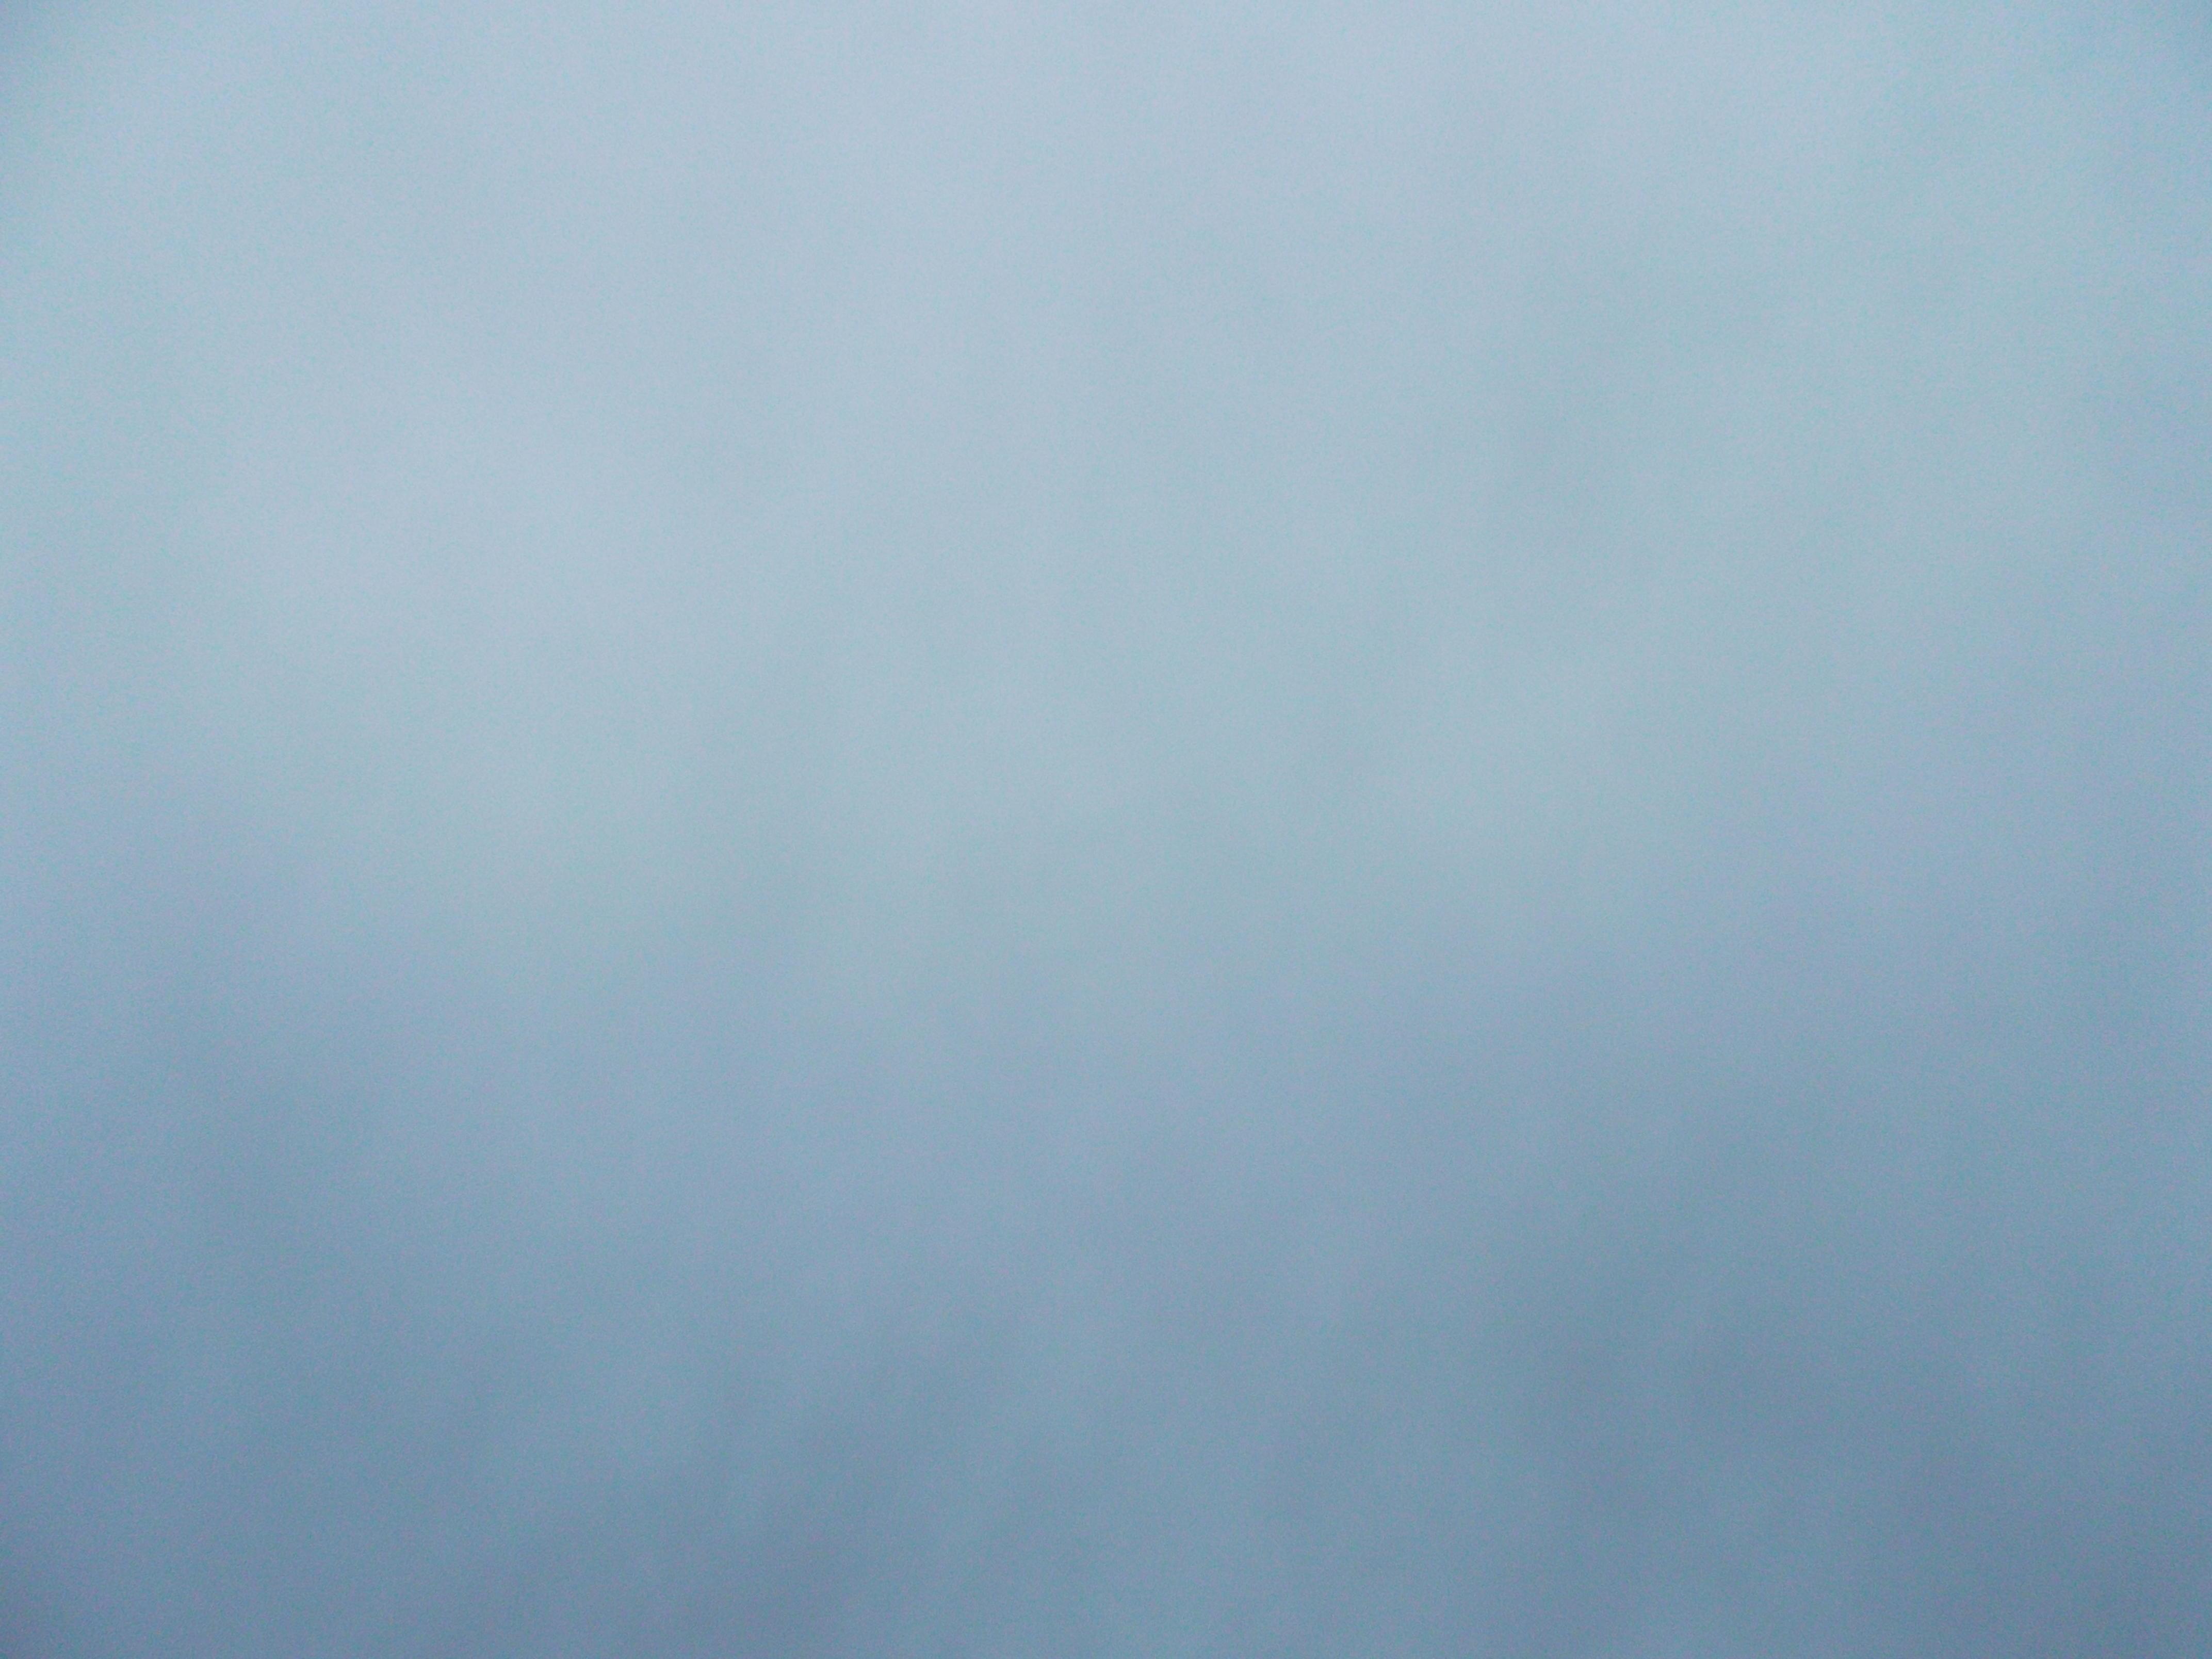 2013-01-22 Longitude -0.371 Latitude 49.182 Altitude 13 Heure 14h20